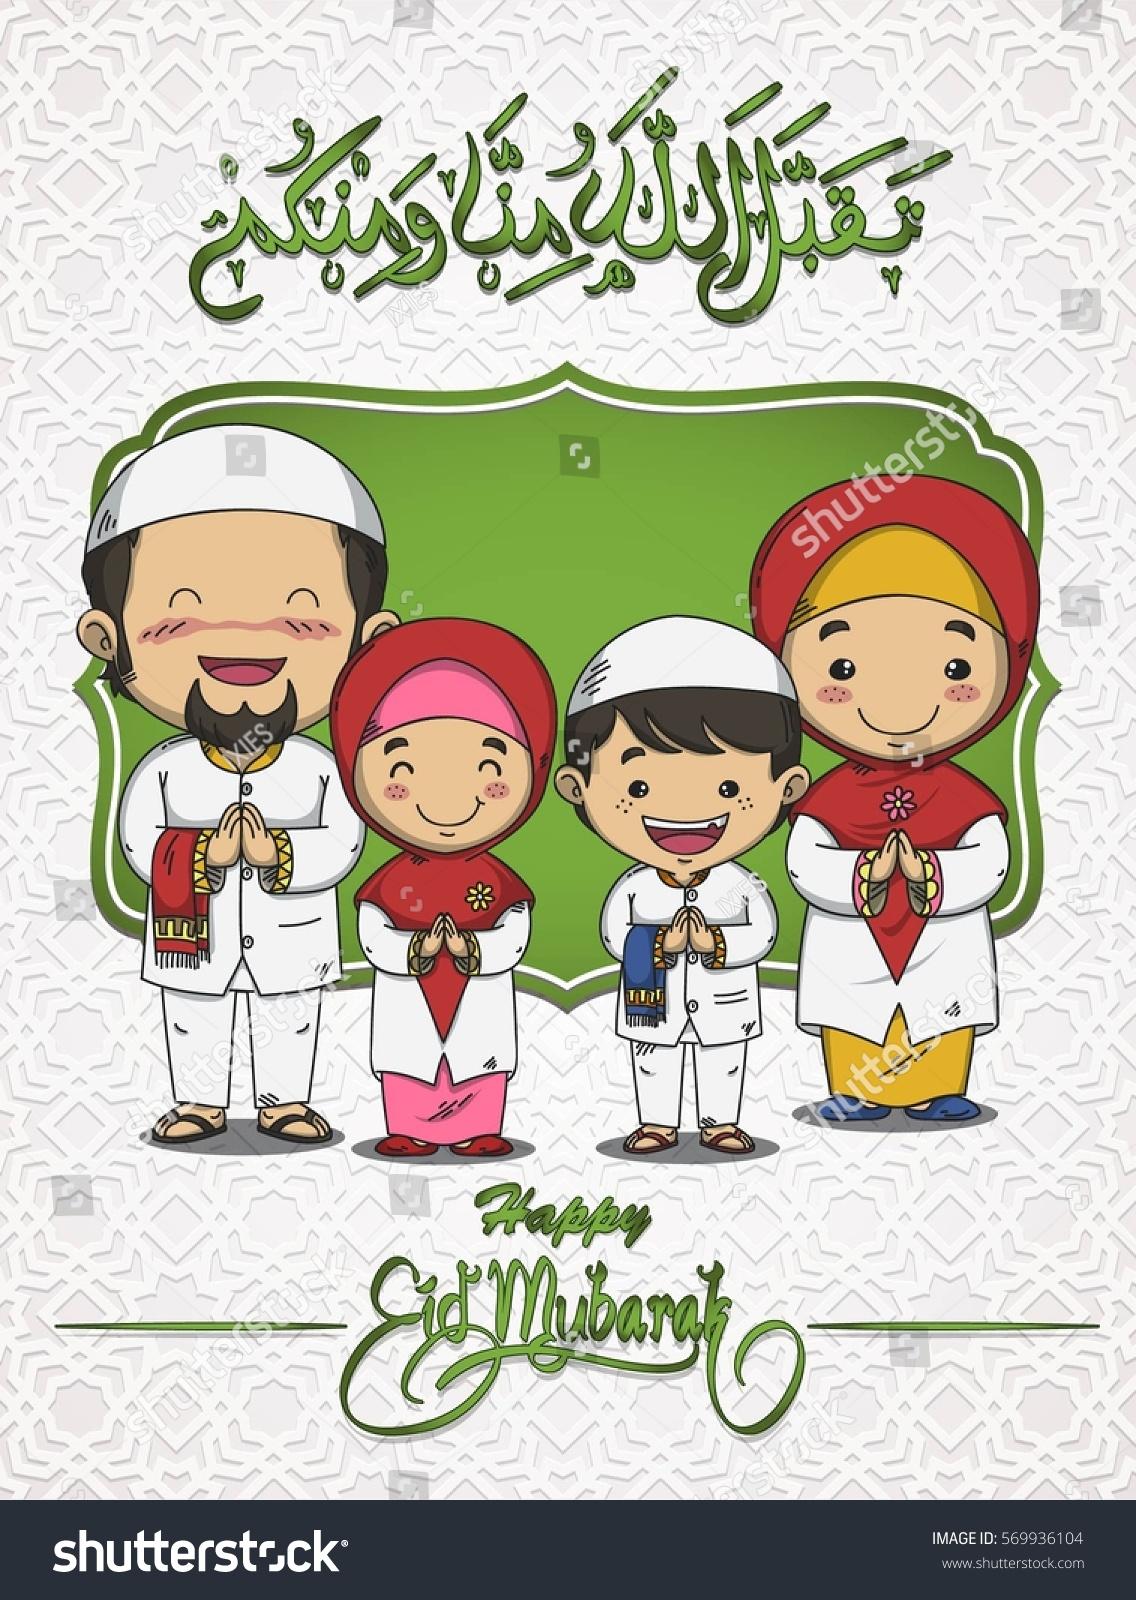 Taqabbalallahu Minna Waminkum : taqabbalallahu, minna, waminkum, Mubarak, Greeting, Cartoon, Moslem, Stock, Vector, (Royalty, Free), 569936104